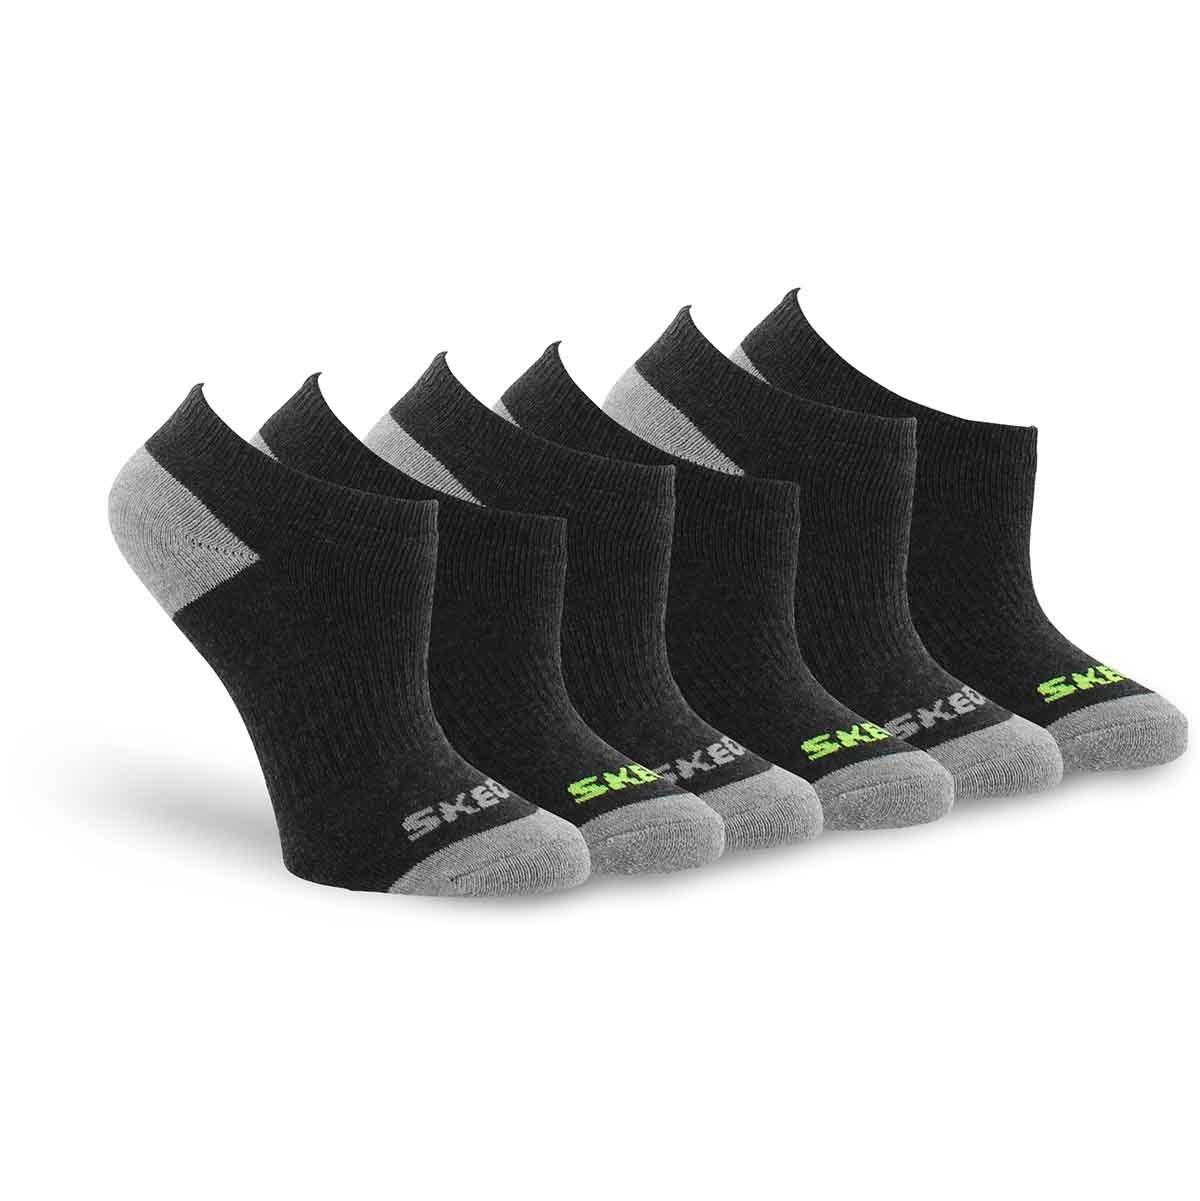 Bys NoShow FullTerry blk mlt sock 6p